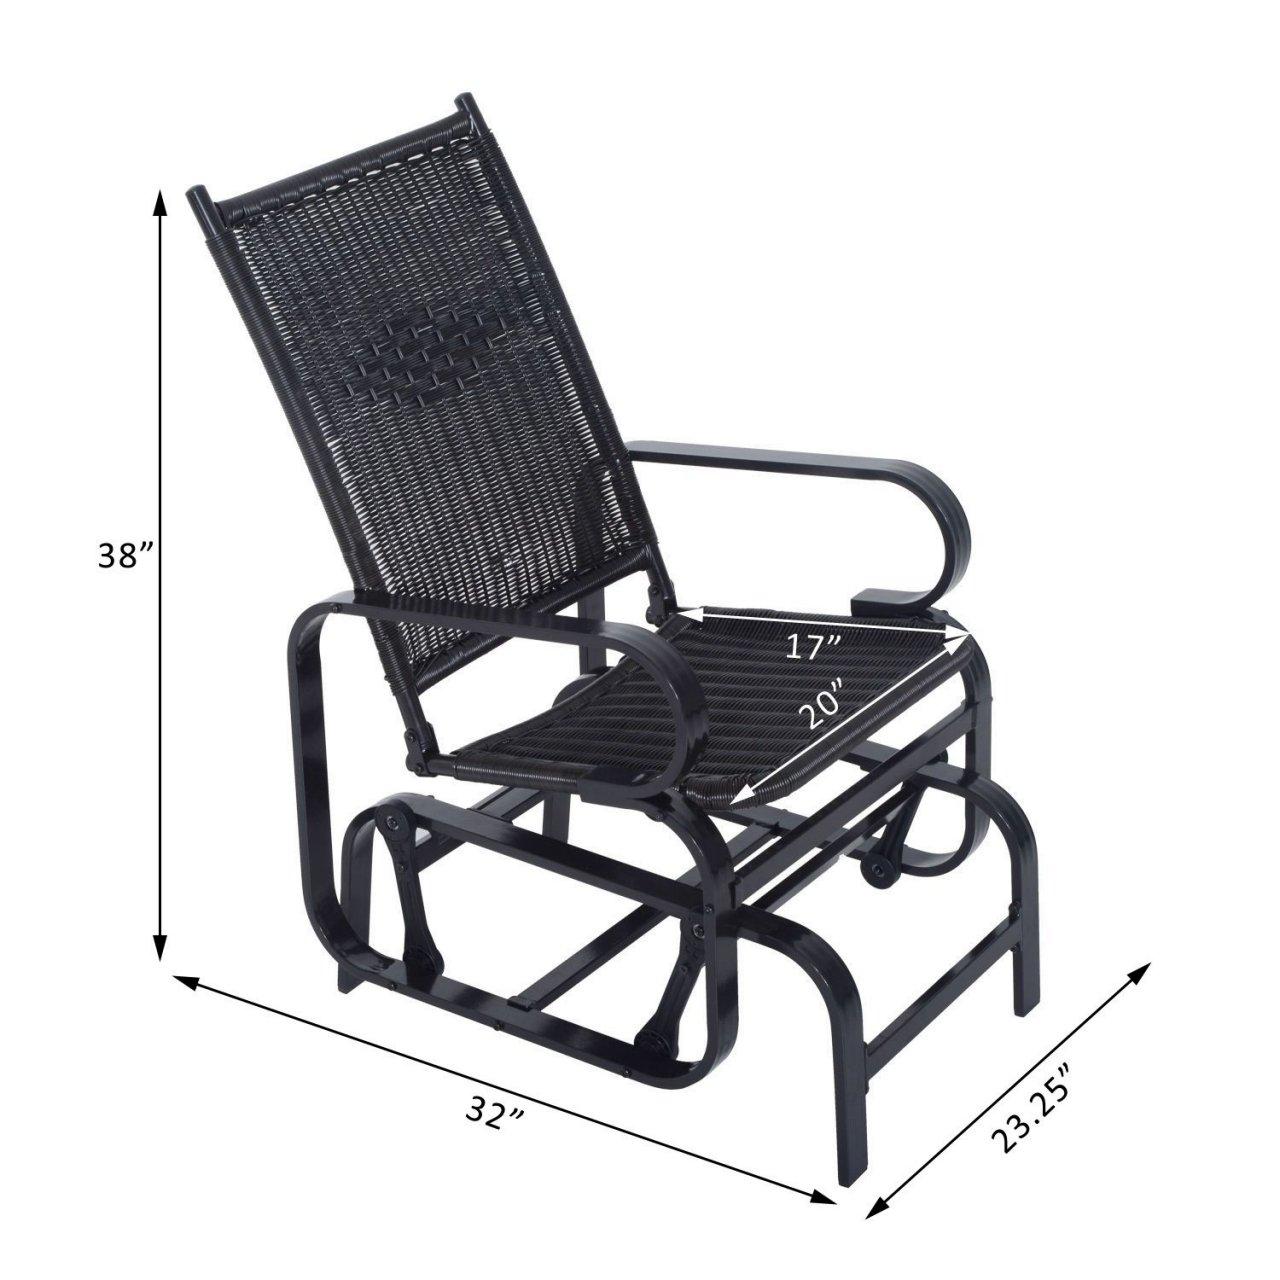 Koonlert@shop Outdoor Rattan Patio Glider Swing Chair Rocking Seat Wicker Desk Furniture #705b